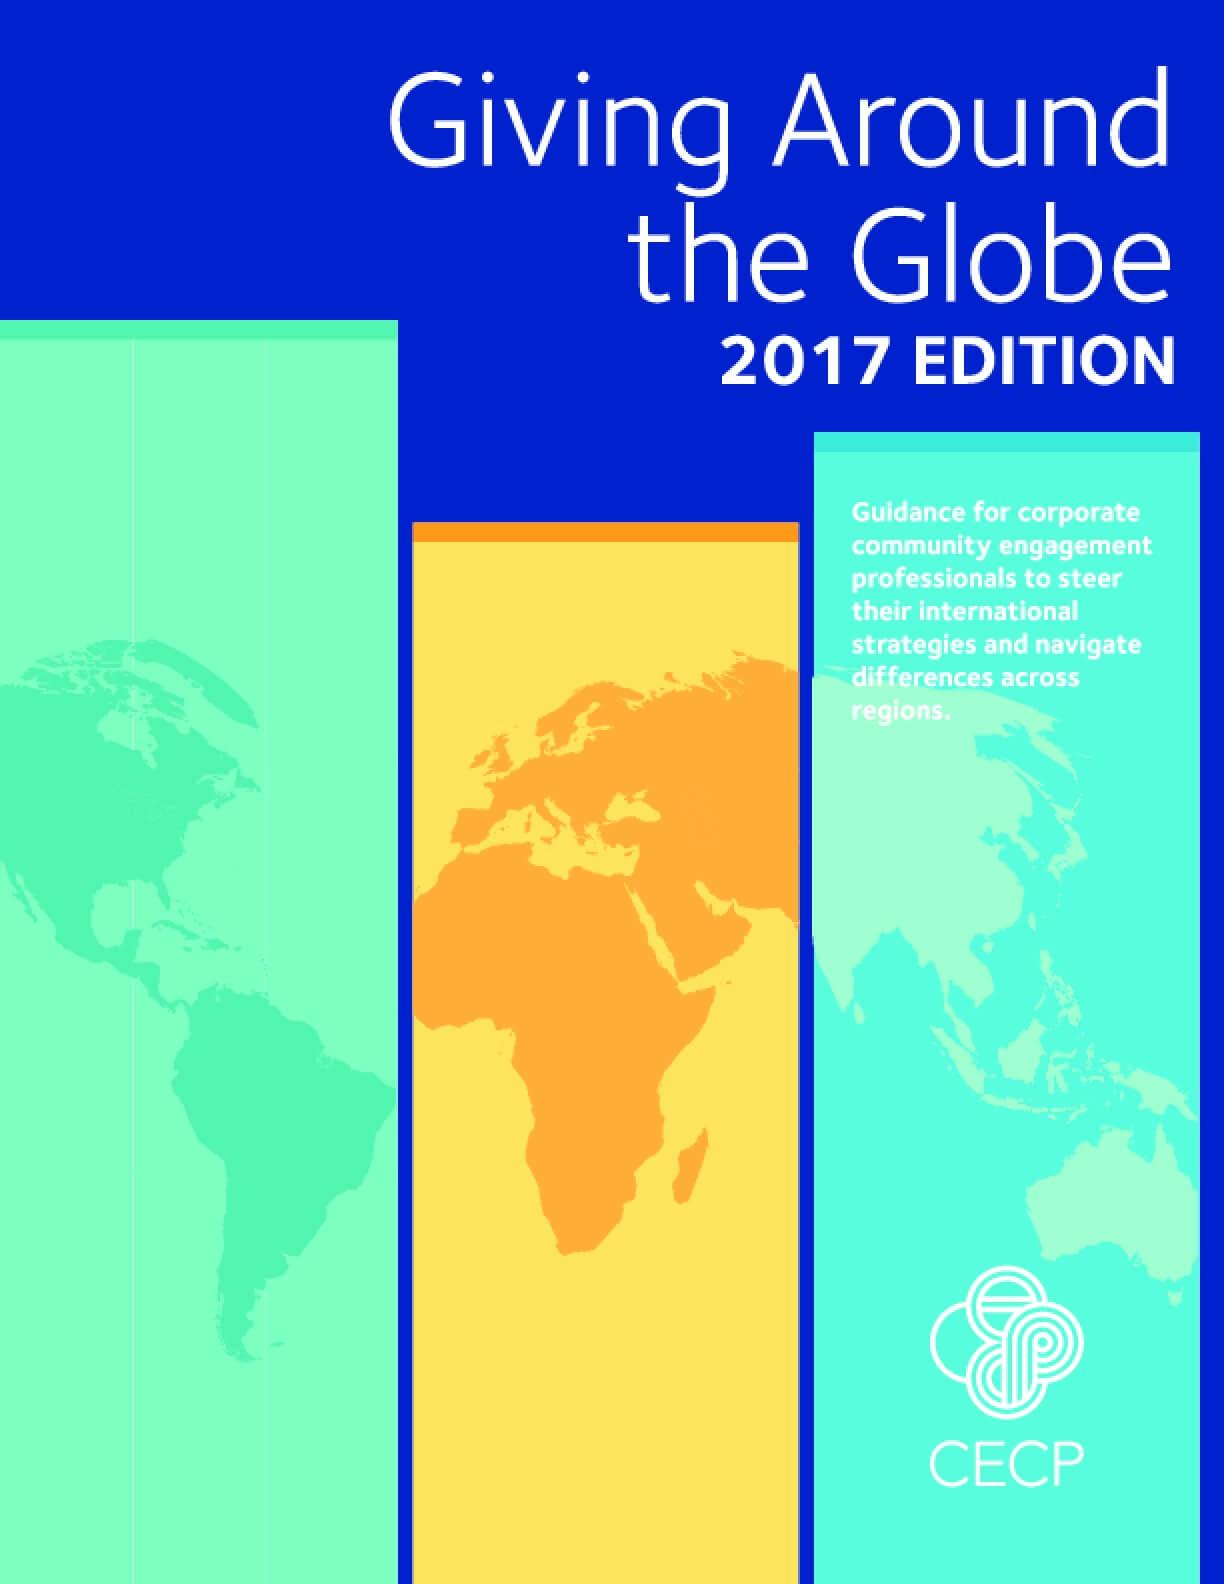 Giving Around the Globe 2017 Edition